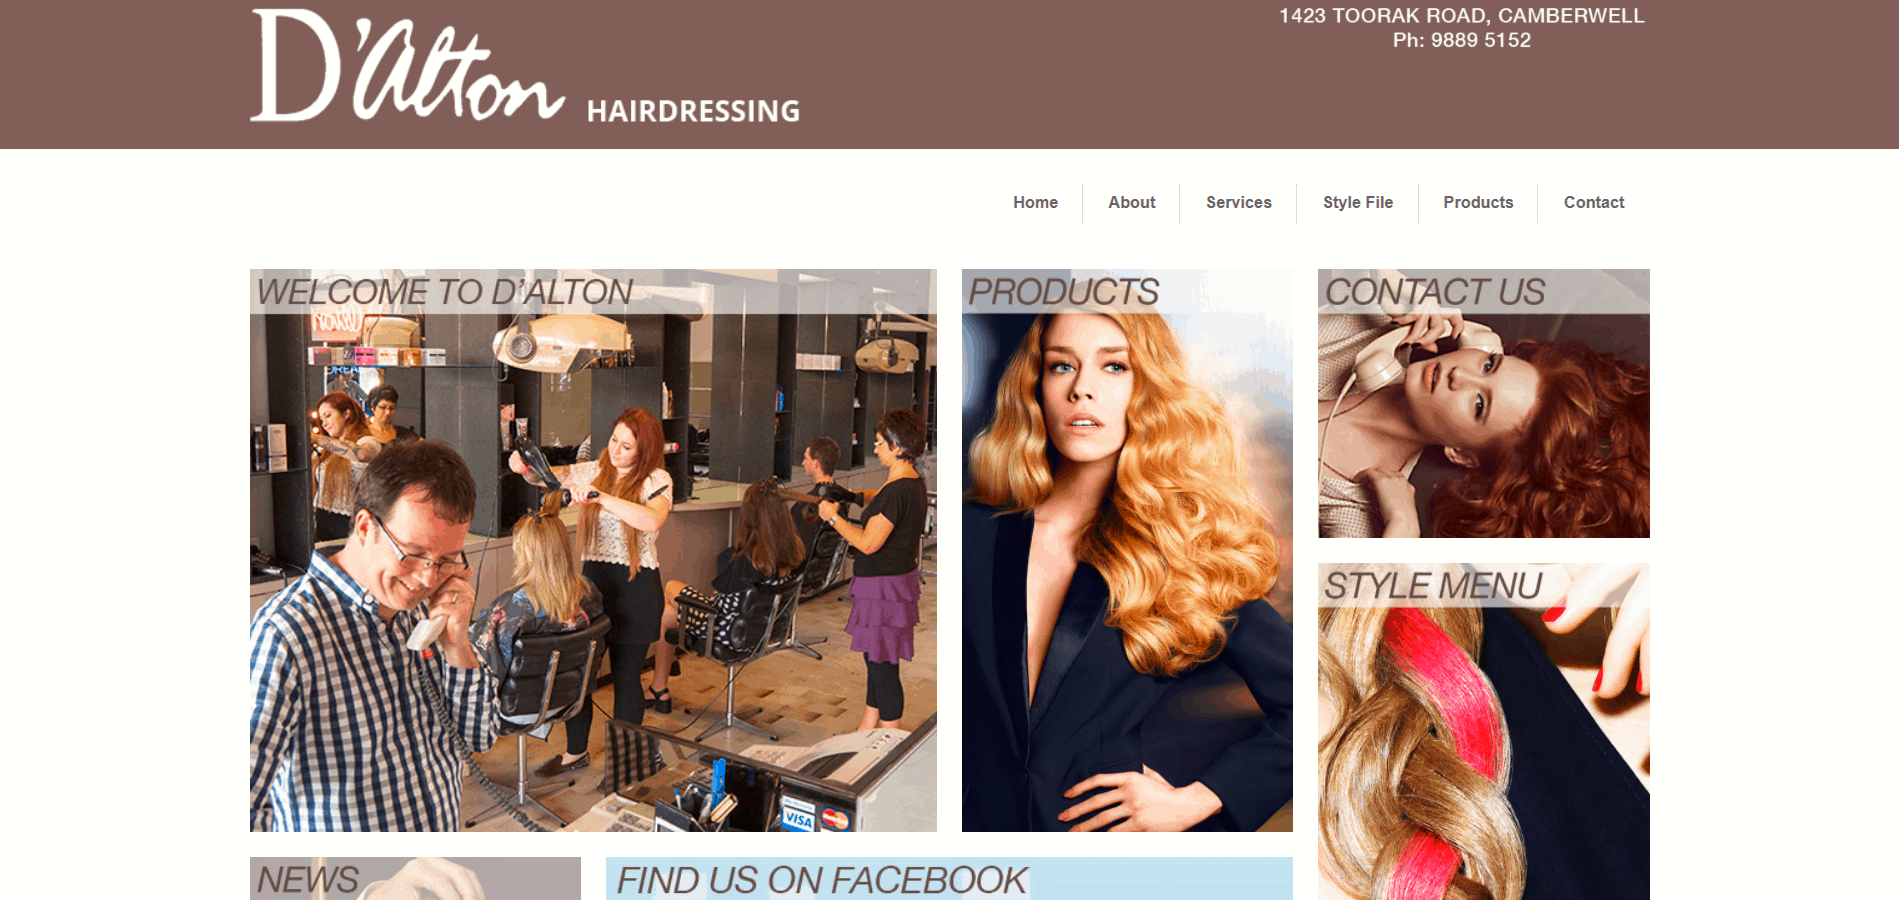 D'alton Hairdressing